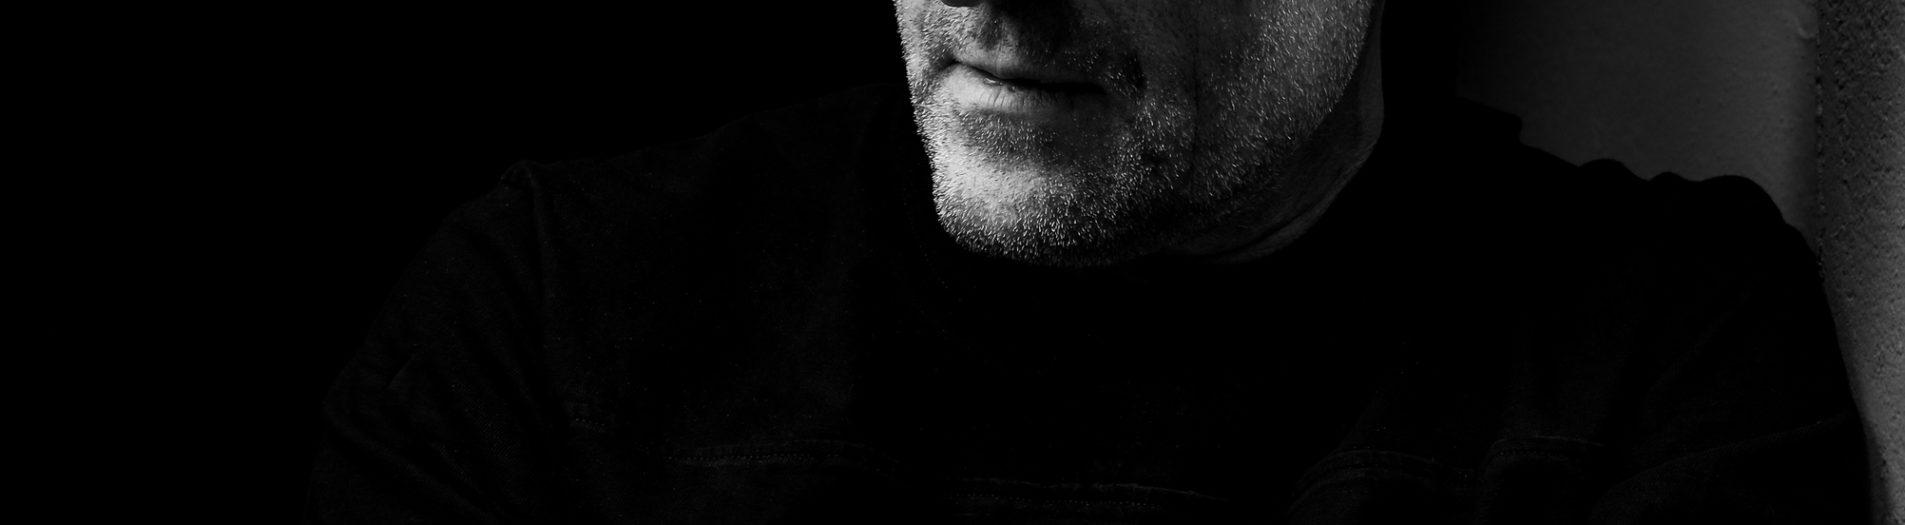 @PortraitsOfColors Training/Shoot x @BennyGroeninga @Benny_Groeninga_Colour [15-10-2021] by DillenvanderMolen @MrOfColorsPhotography